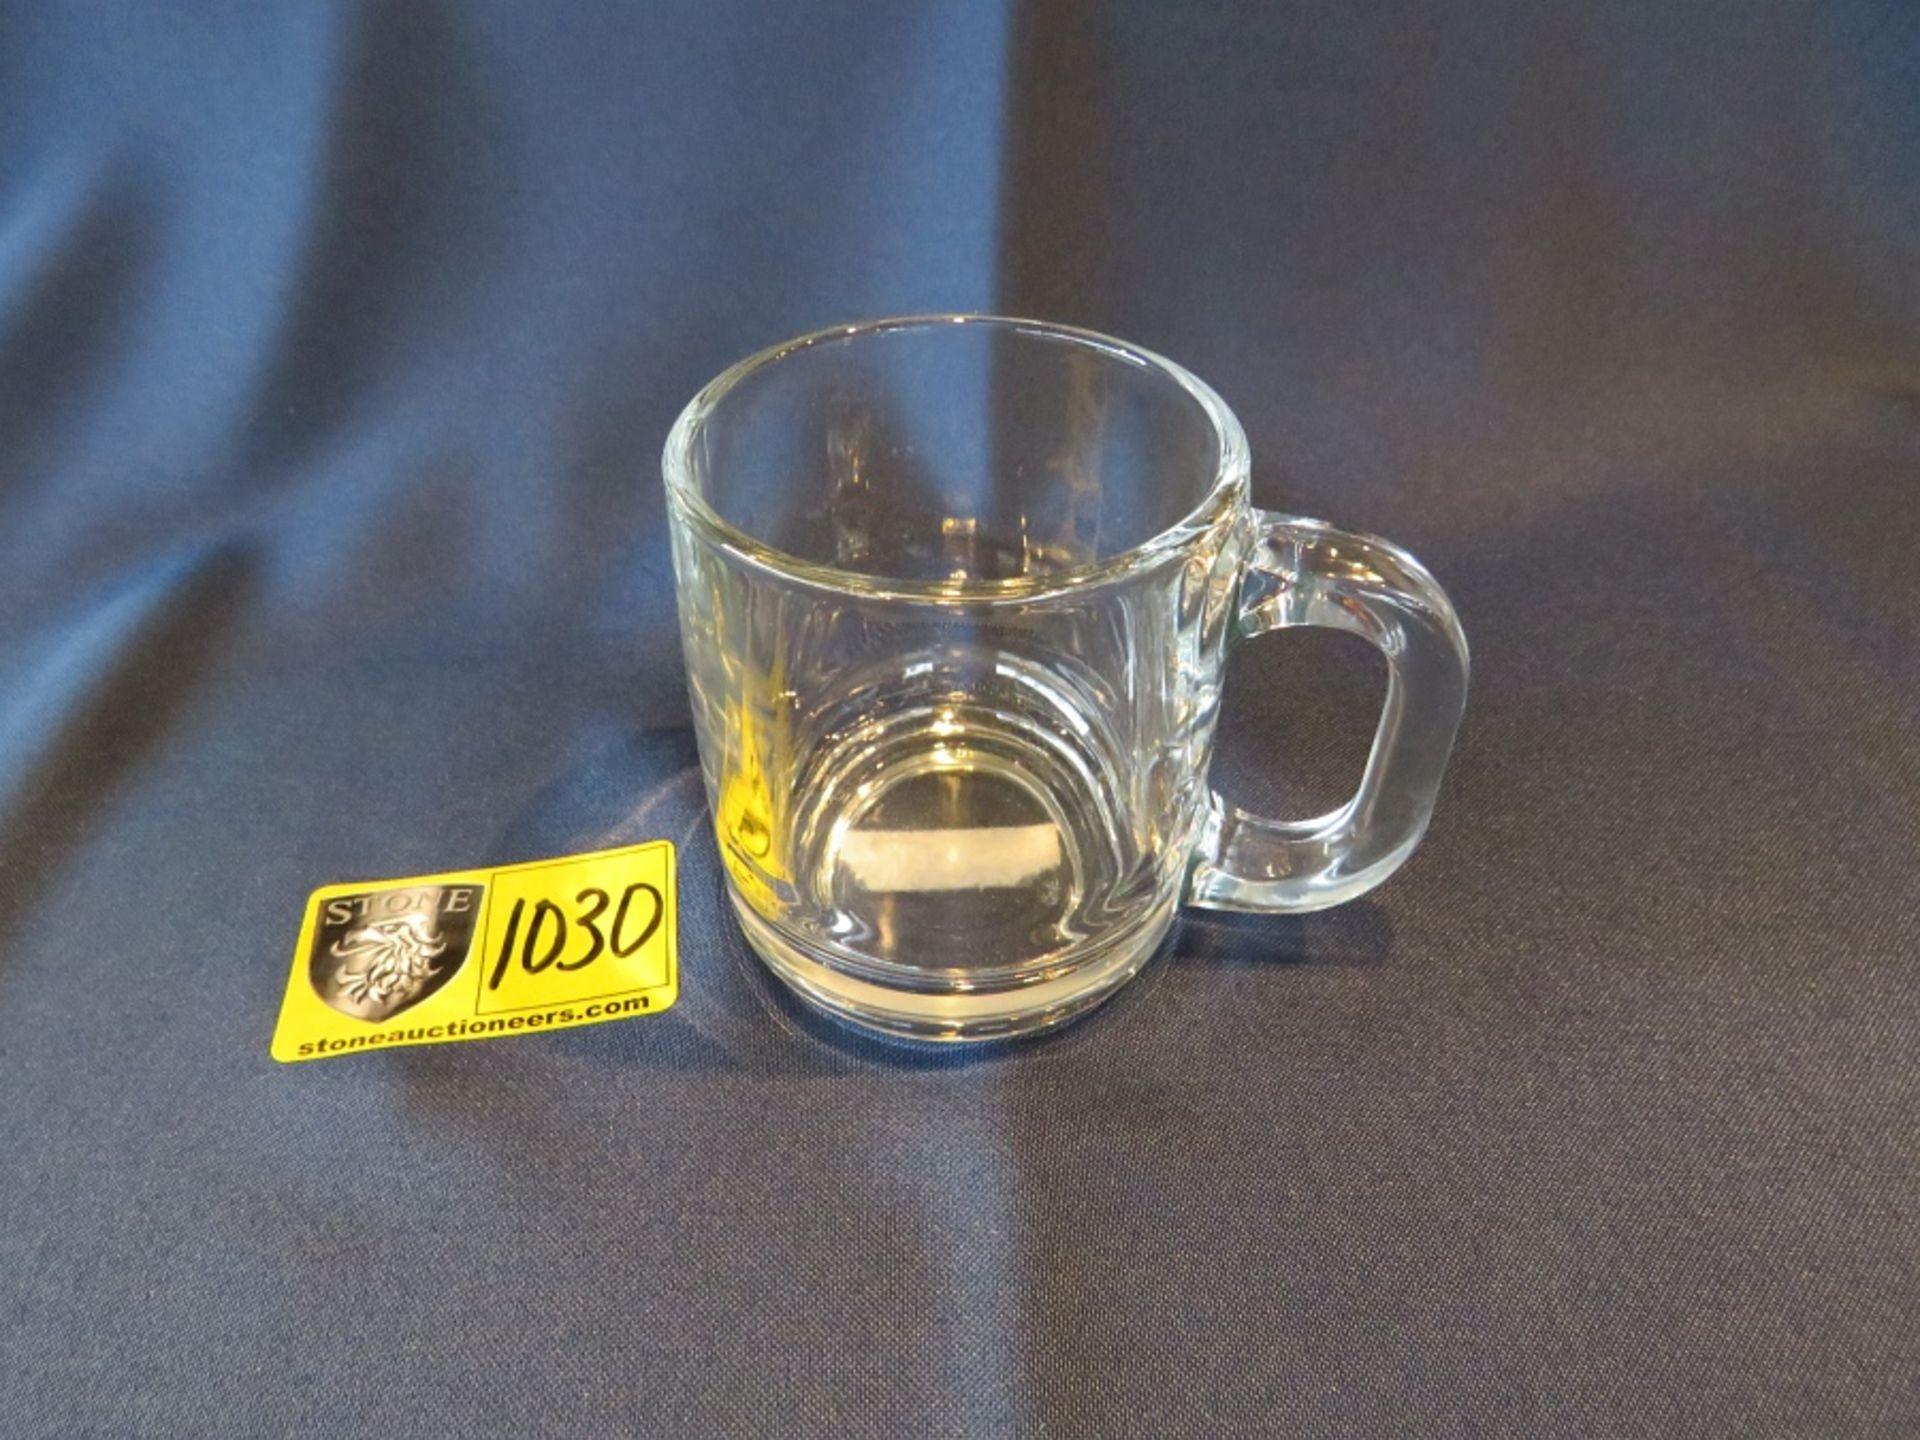 Lot 1030 - MUG GLASS